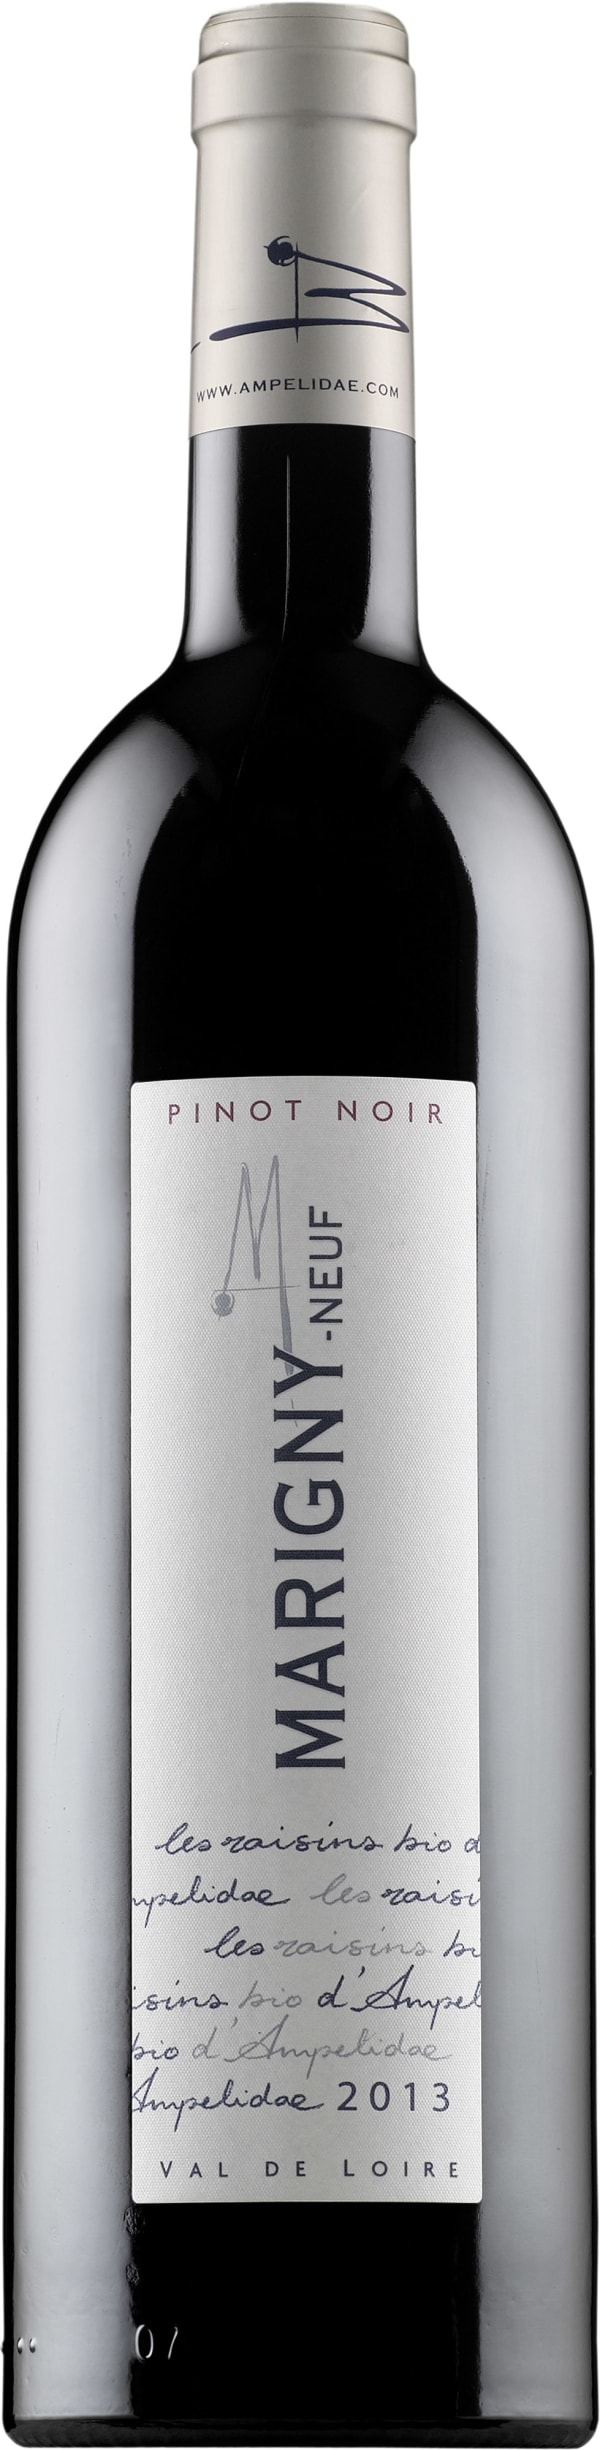 Marigny Neuf Pinot Noir 2015